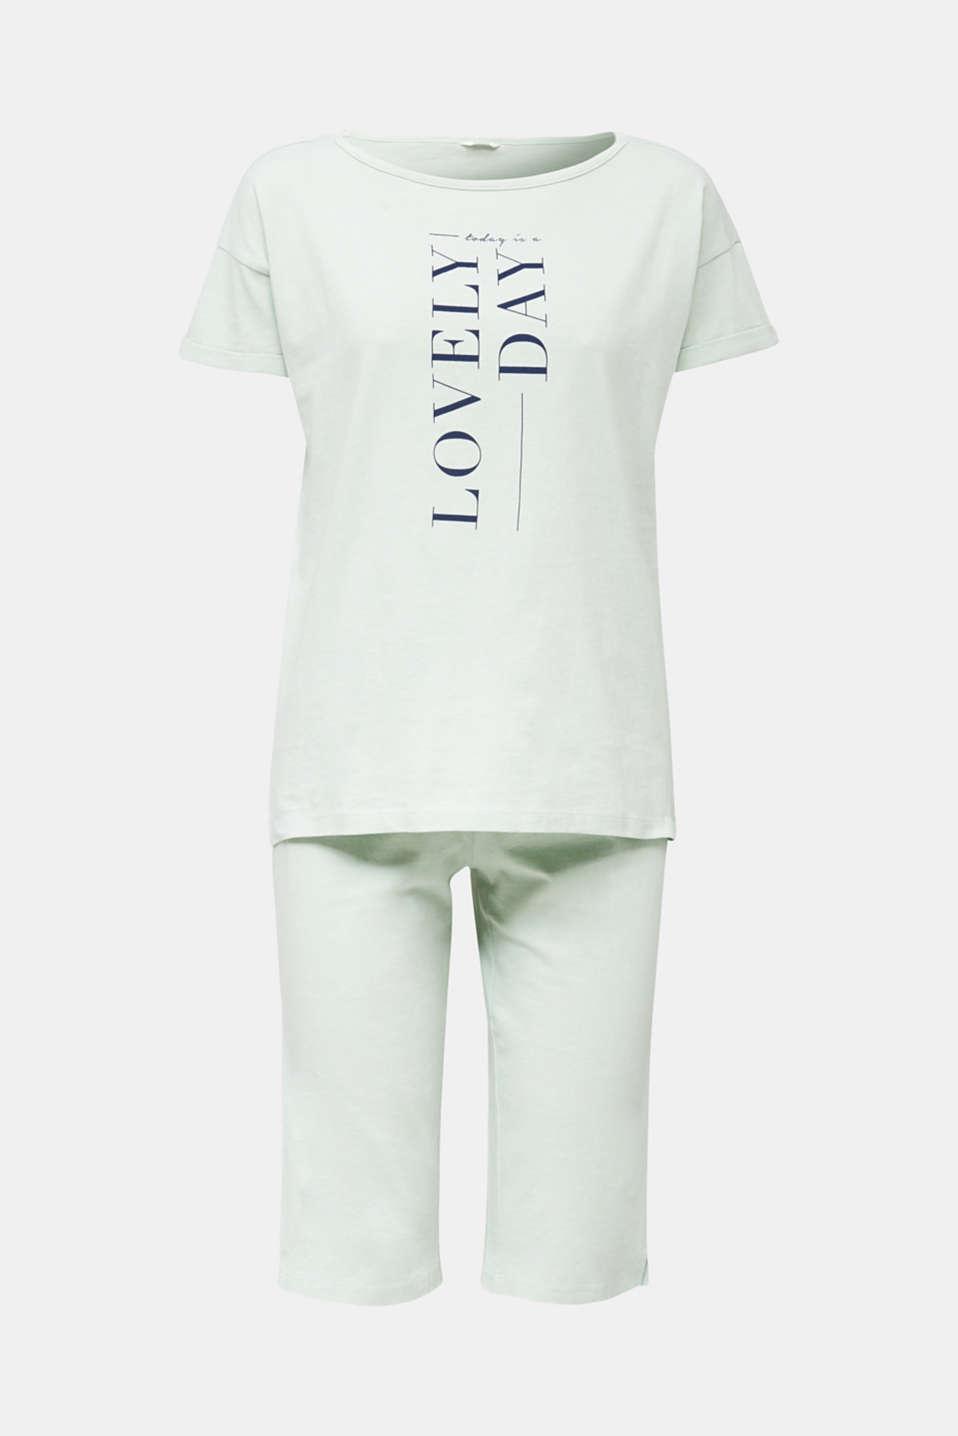 Jersey pyjamas in 100% cotton, LIGHT AQUA GREEN, detail image number 4